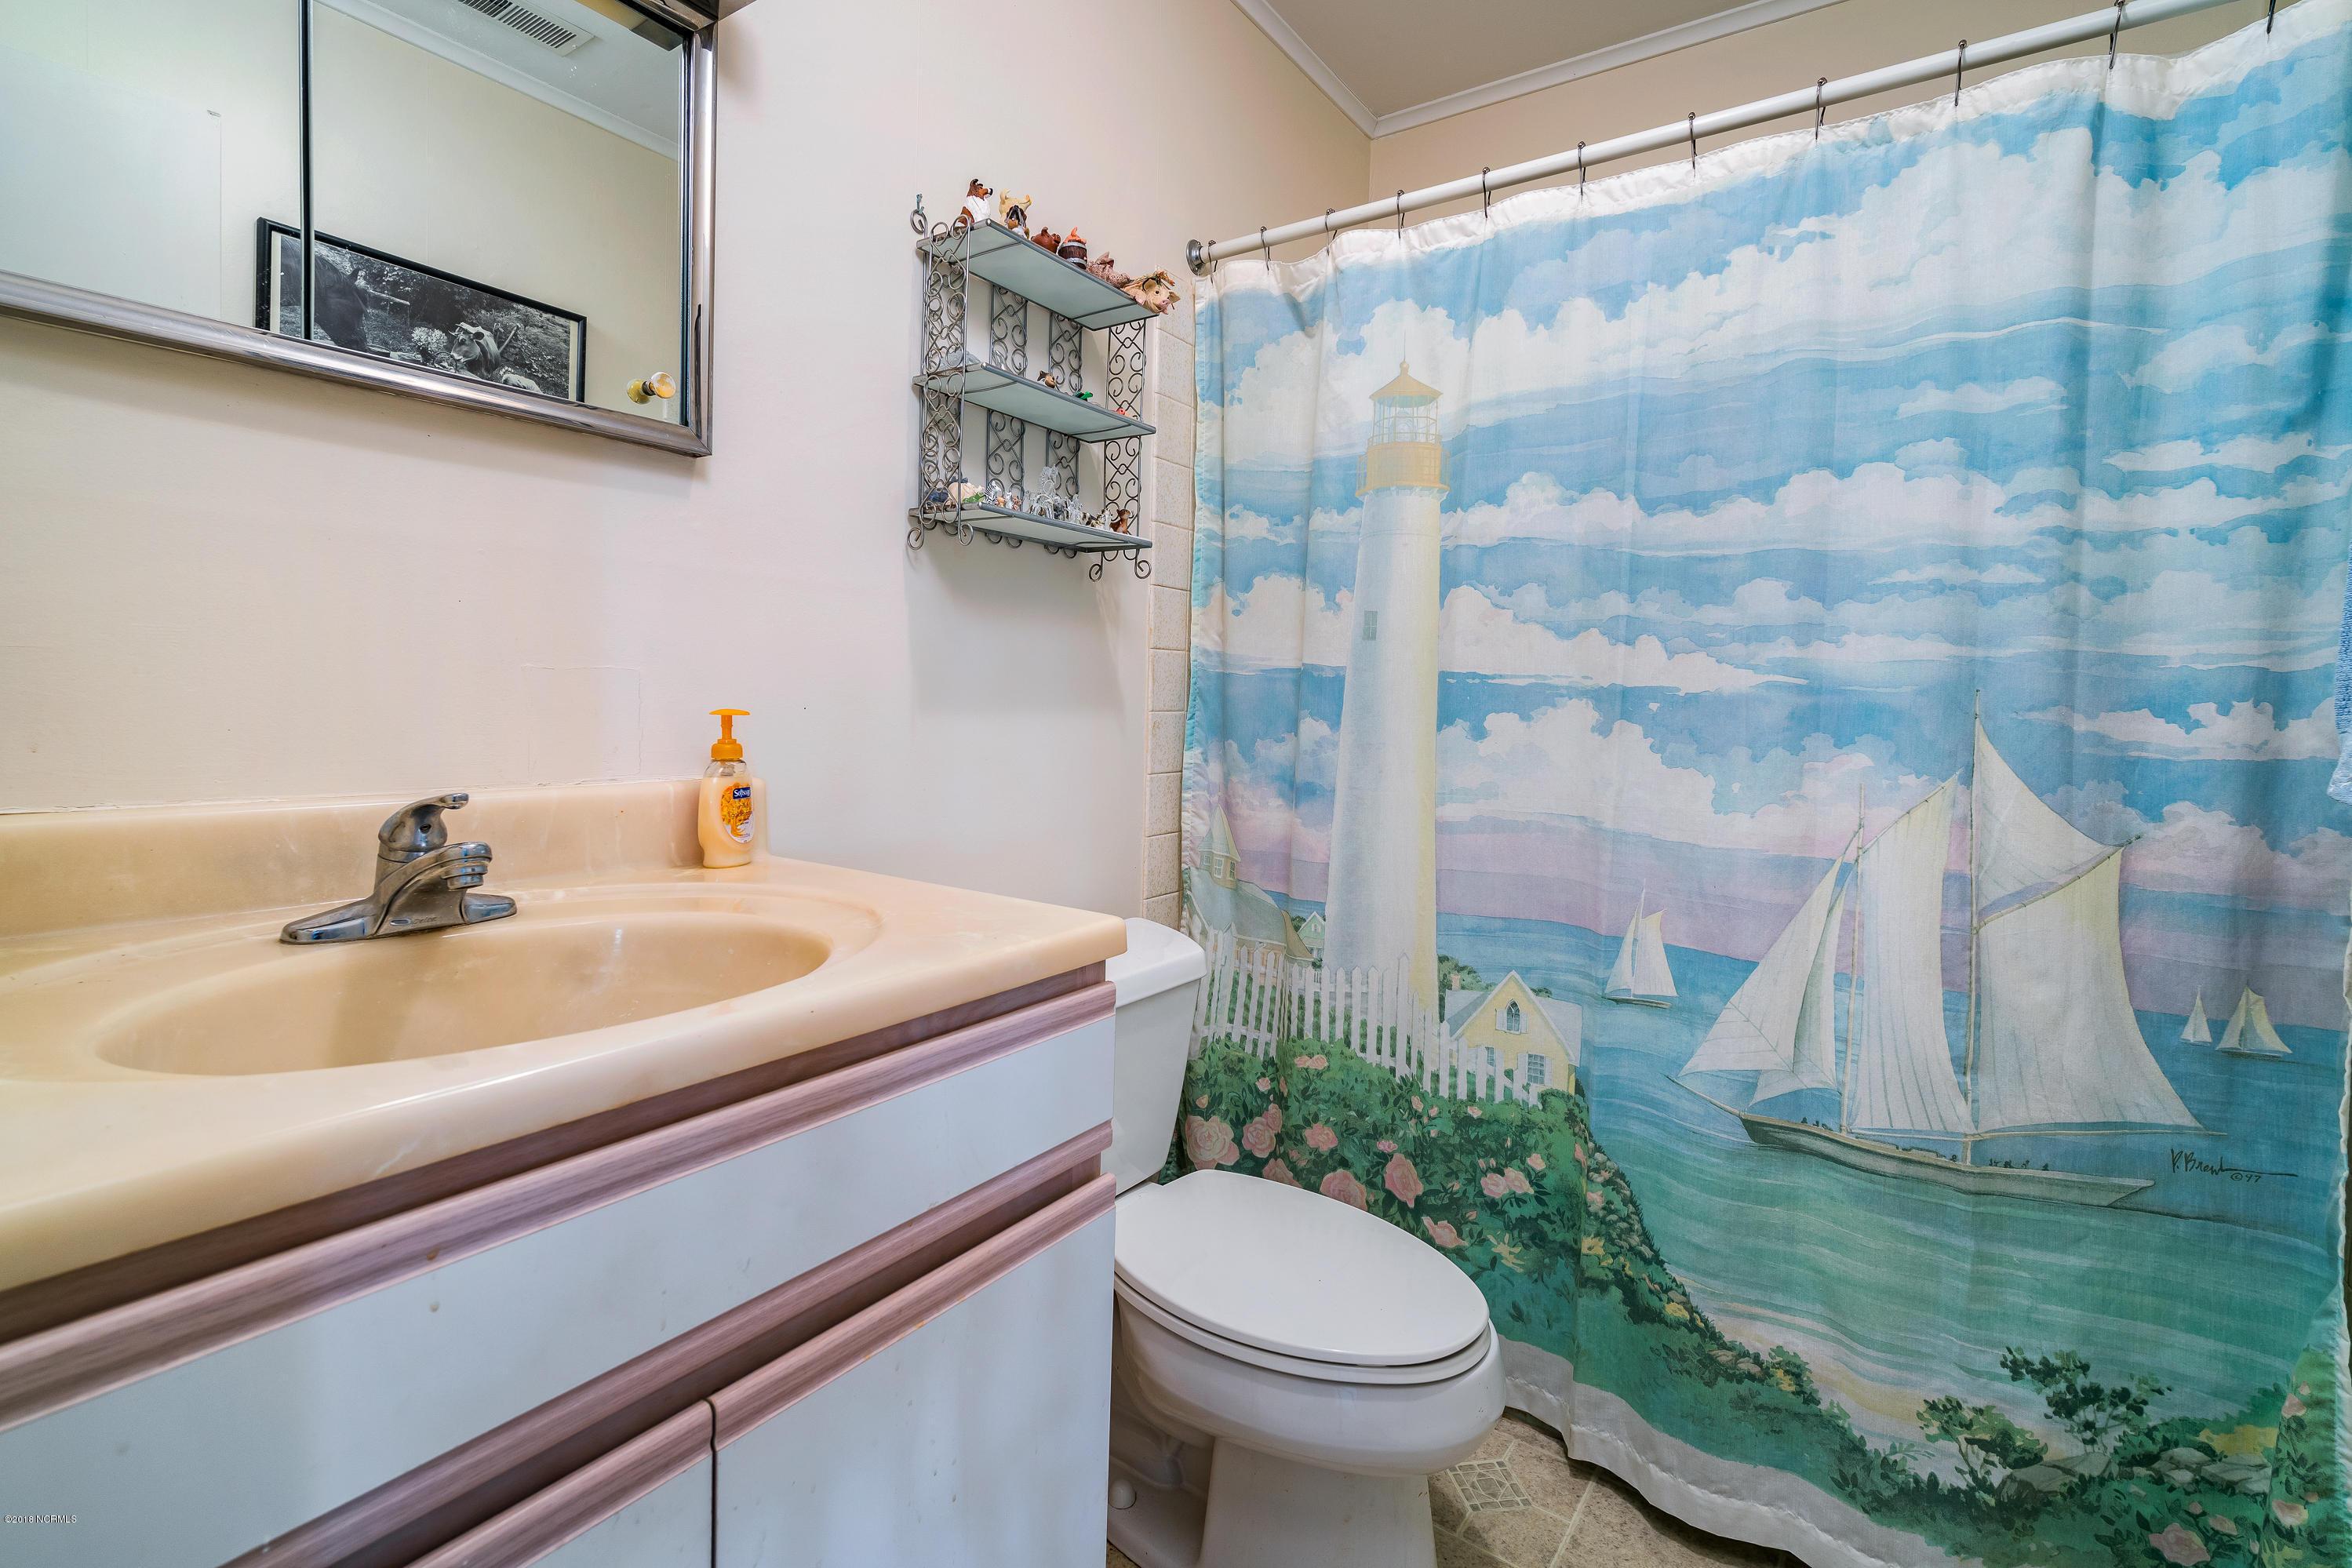 509 Ragan Road, Oriental, North Carolina, 3 Bedrooms Bedrooms, 6 Rooms Rooms,2 BathroomsBathrooms,Single family residence,For sale,Ragan,100101581